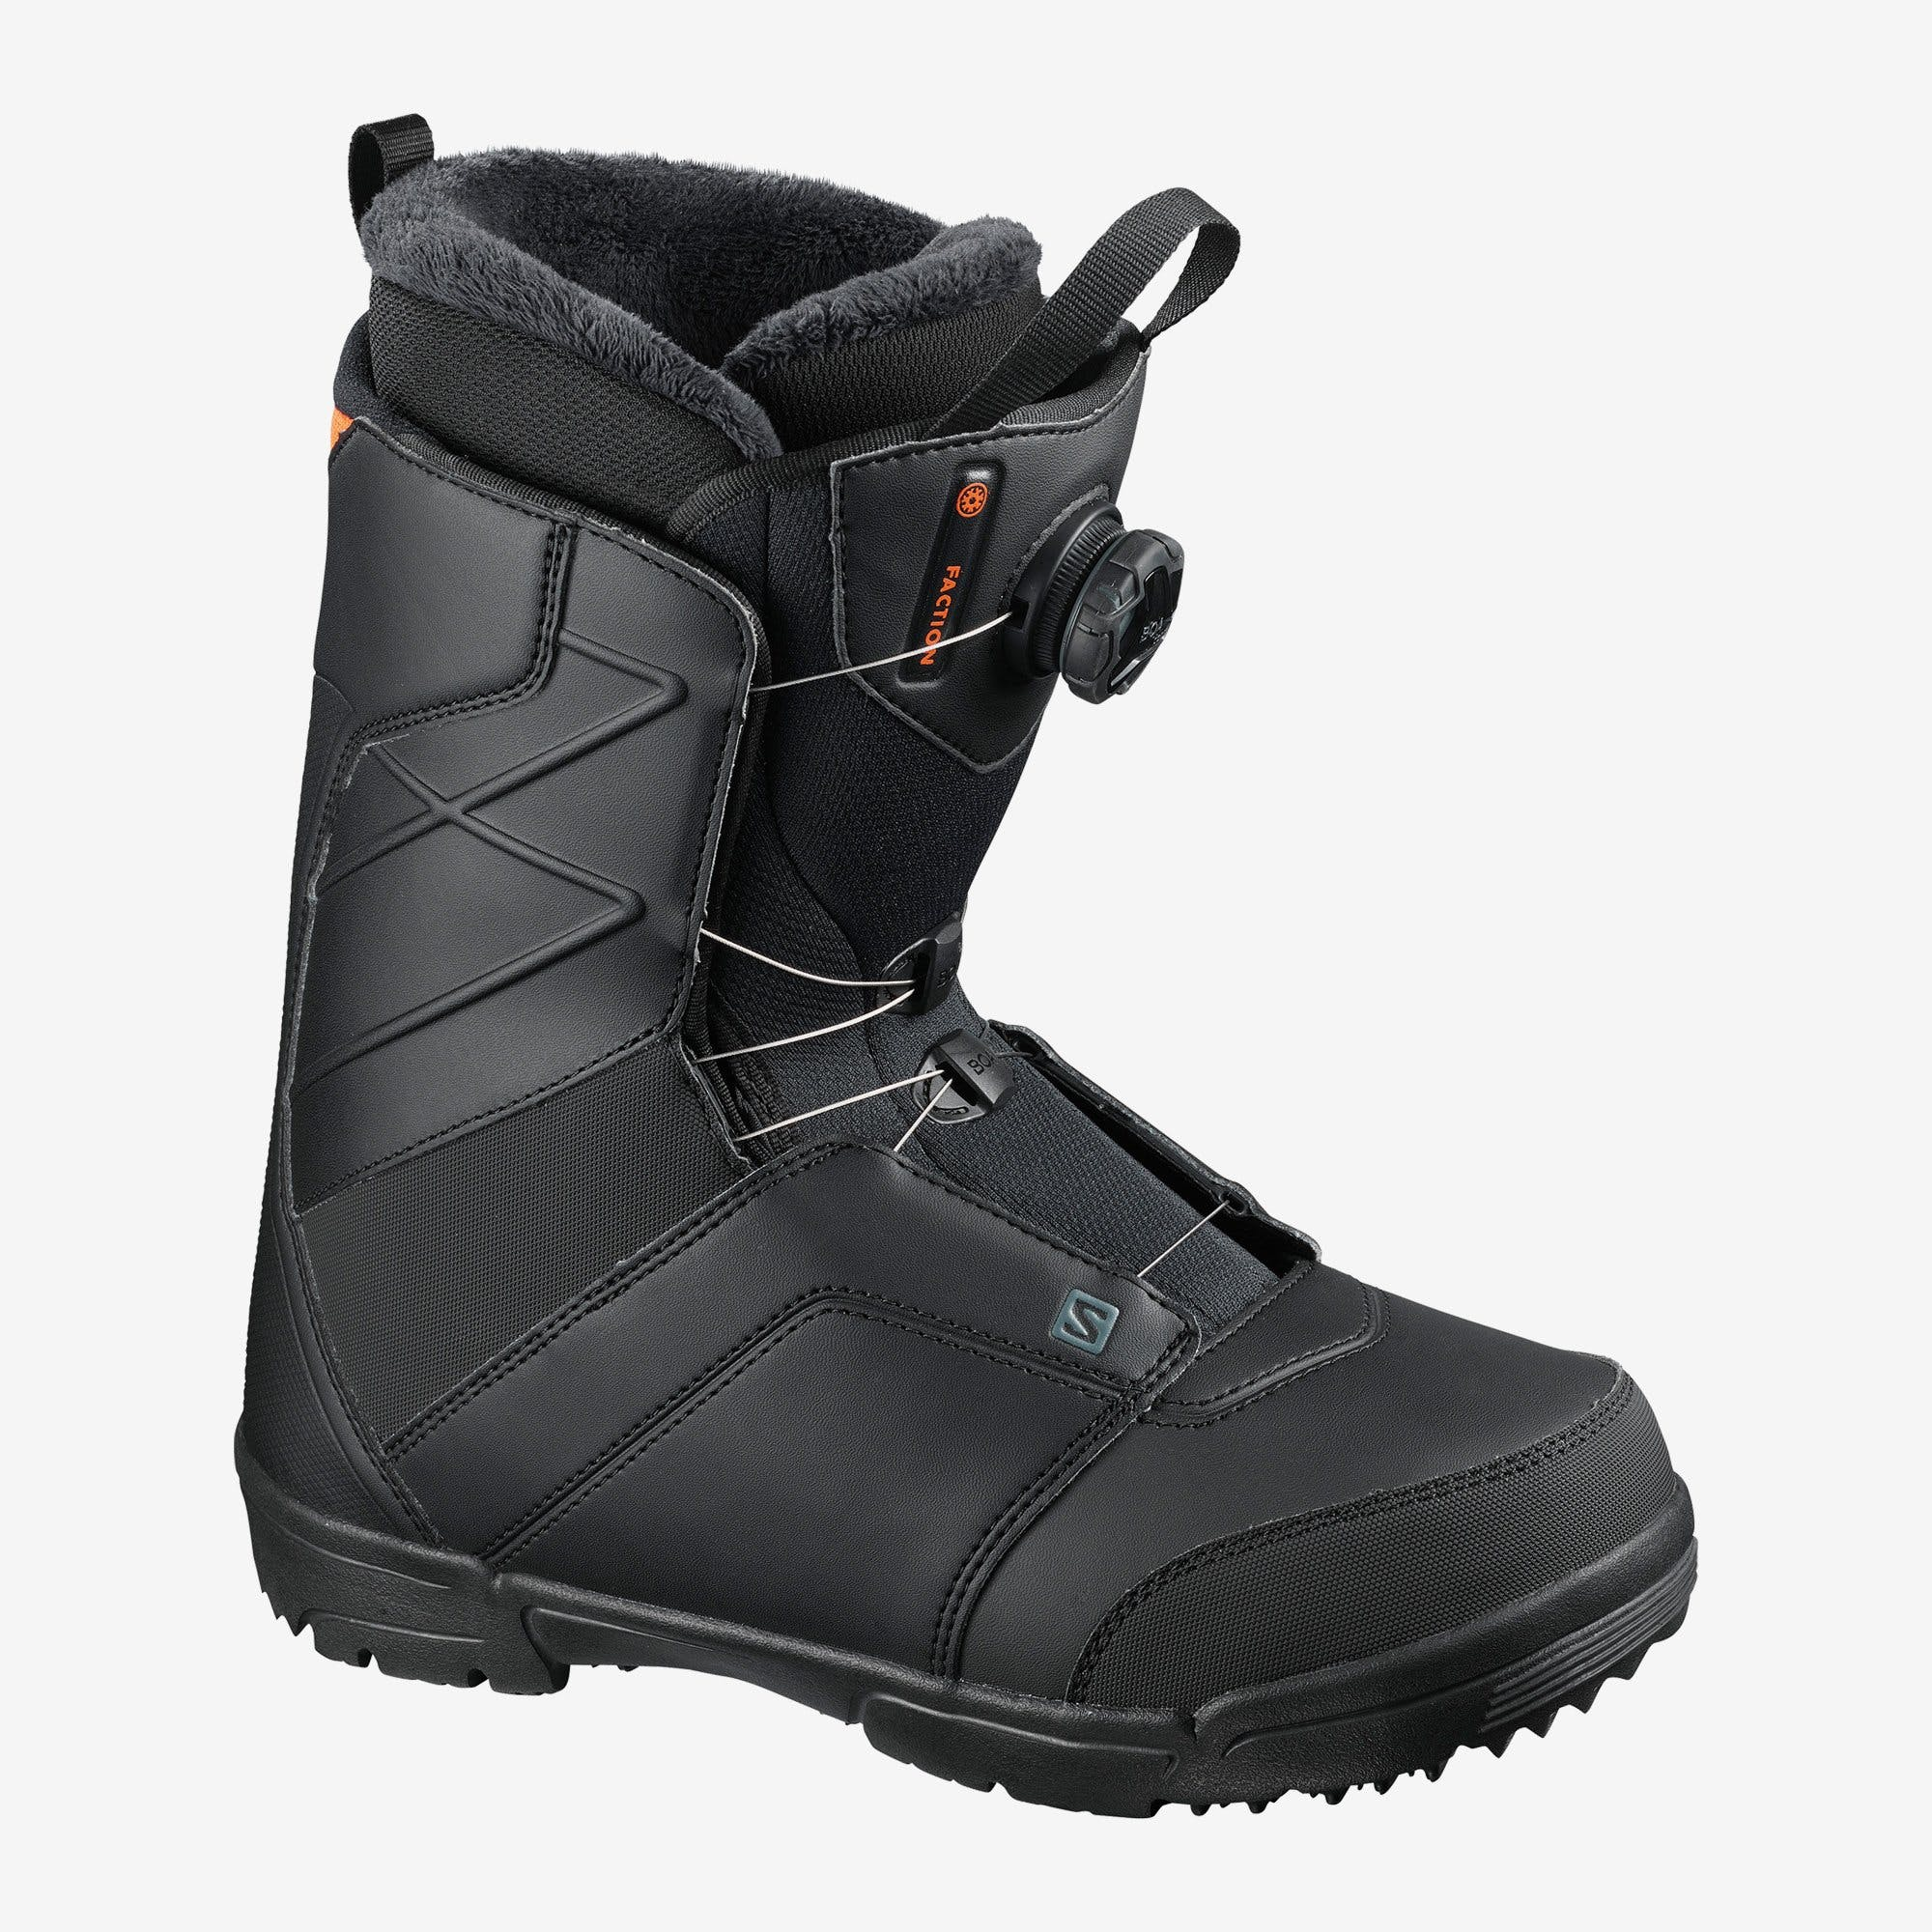 Salomon Faction BOA Snowboard Boots · 2021